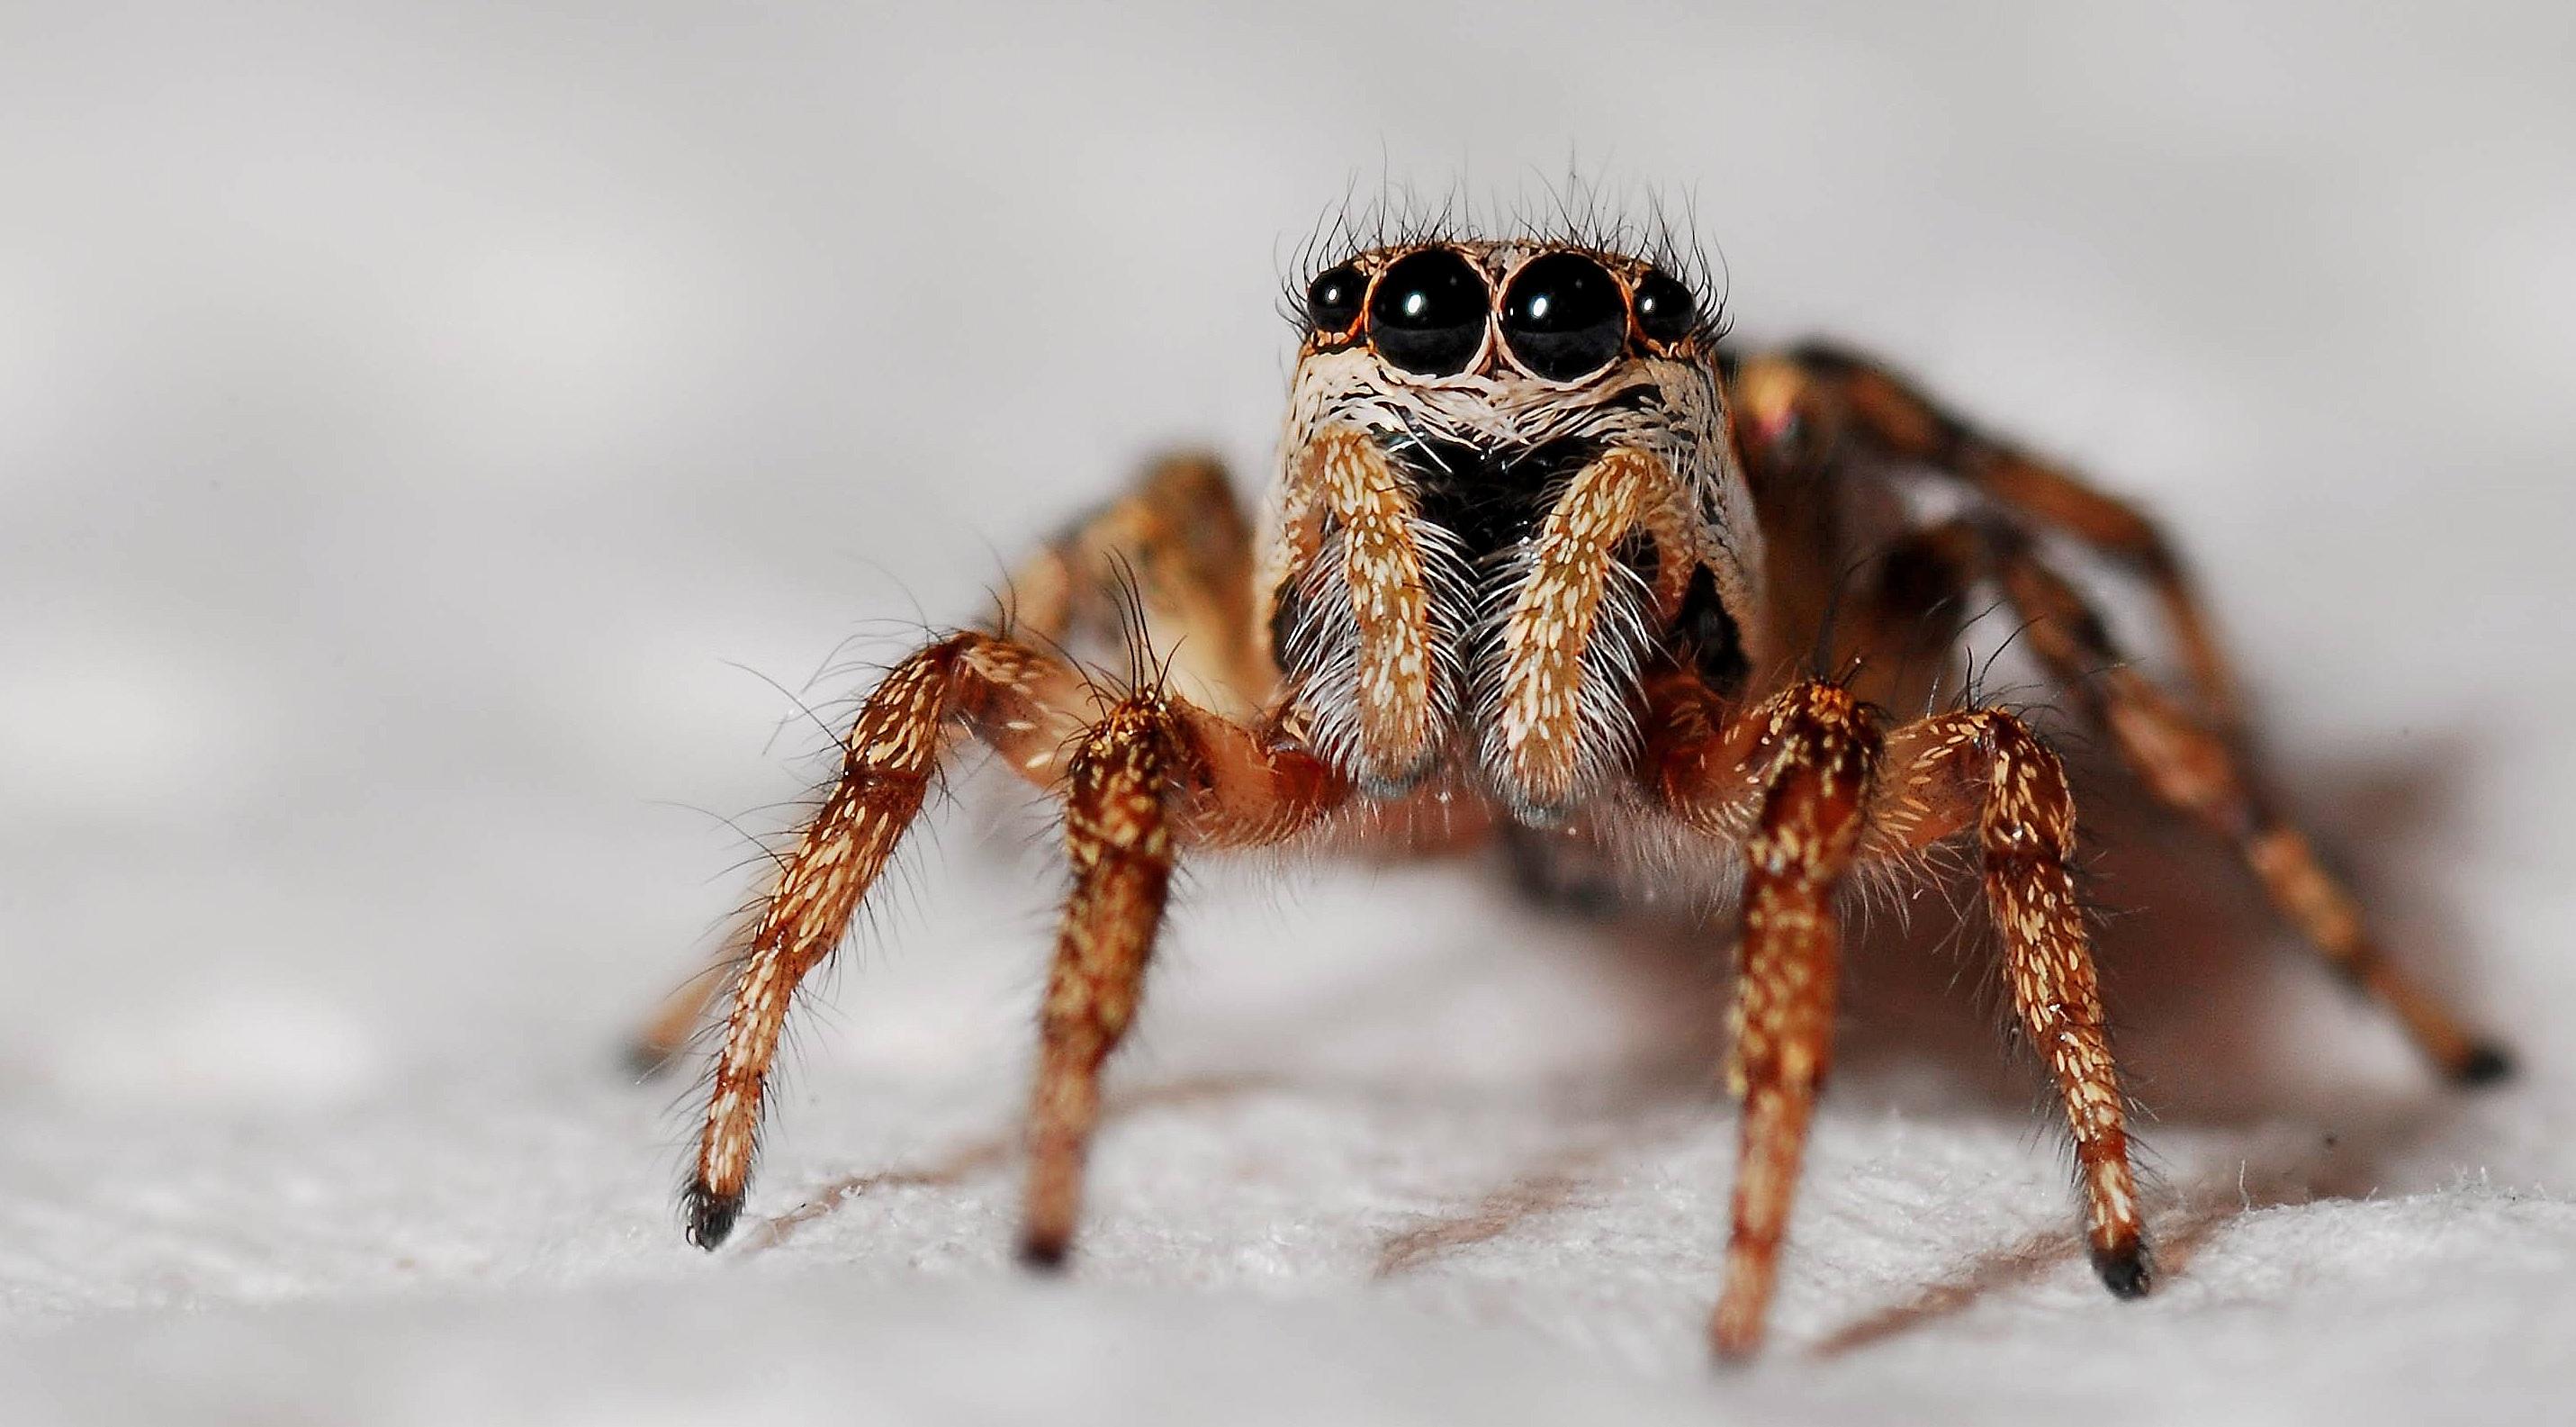 Zebra Spider (via Pexels)